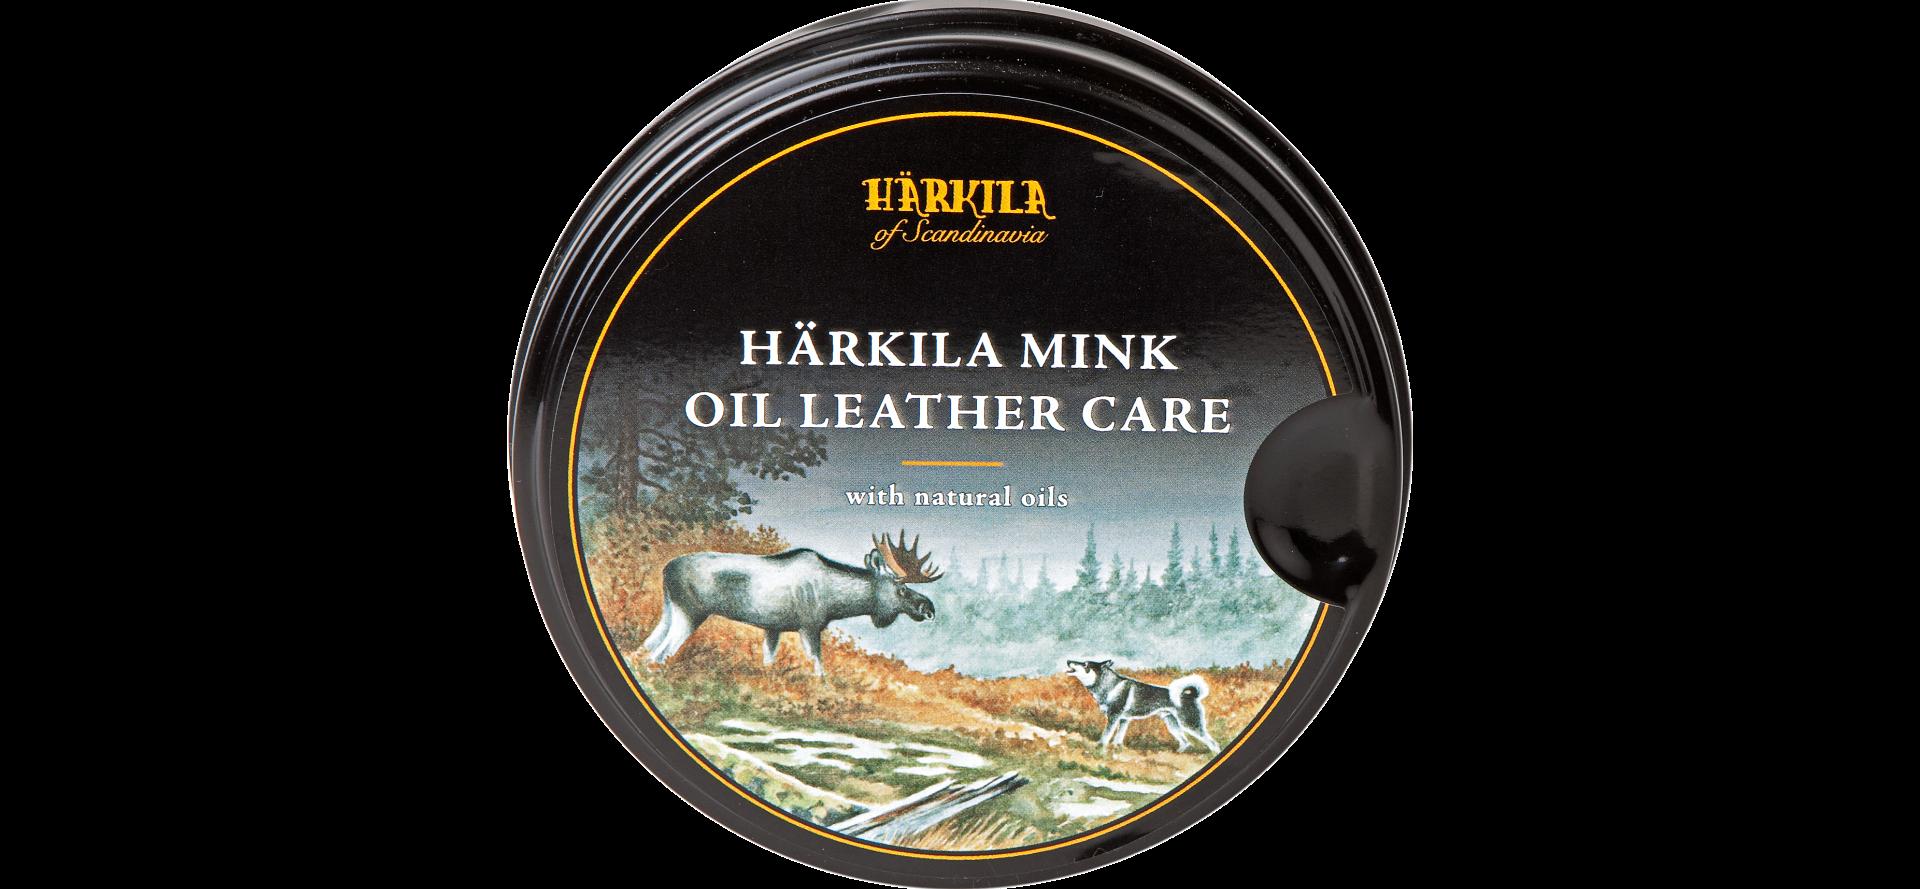 Härklia Mink Oil Leather Care